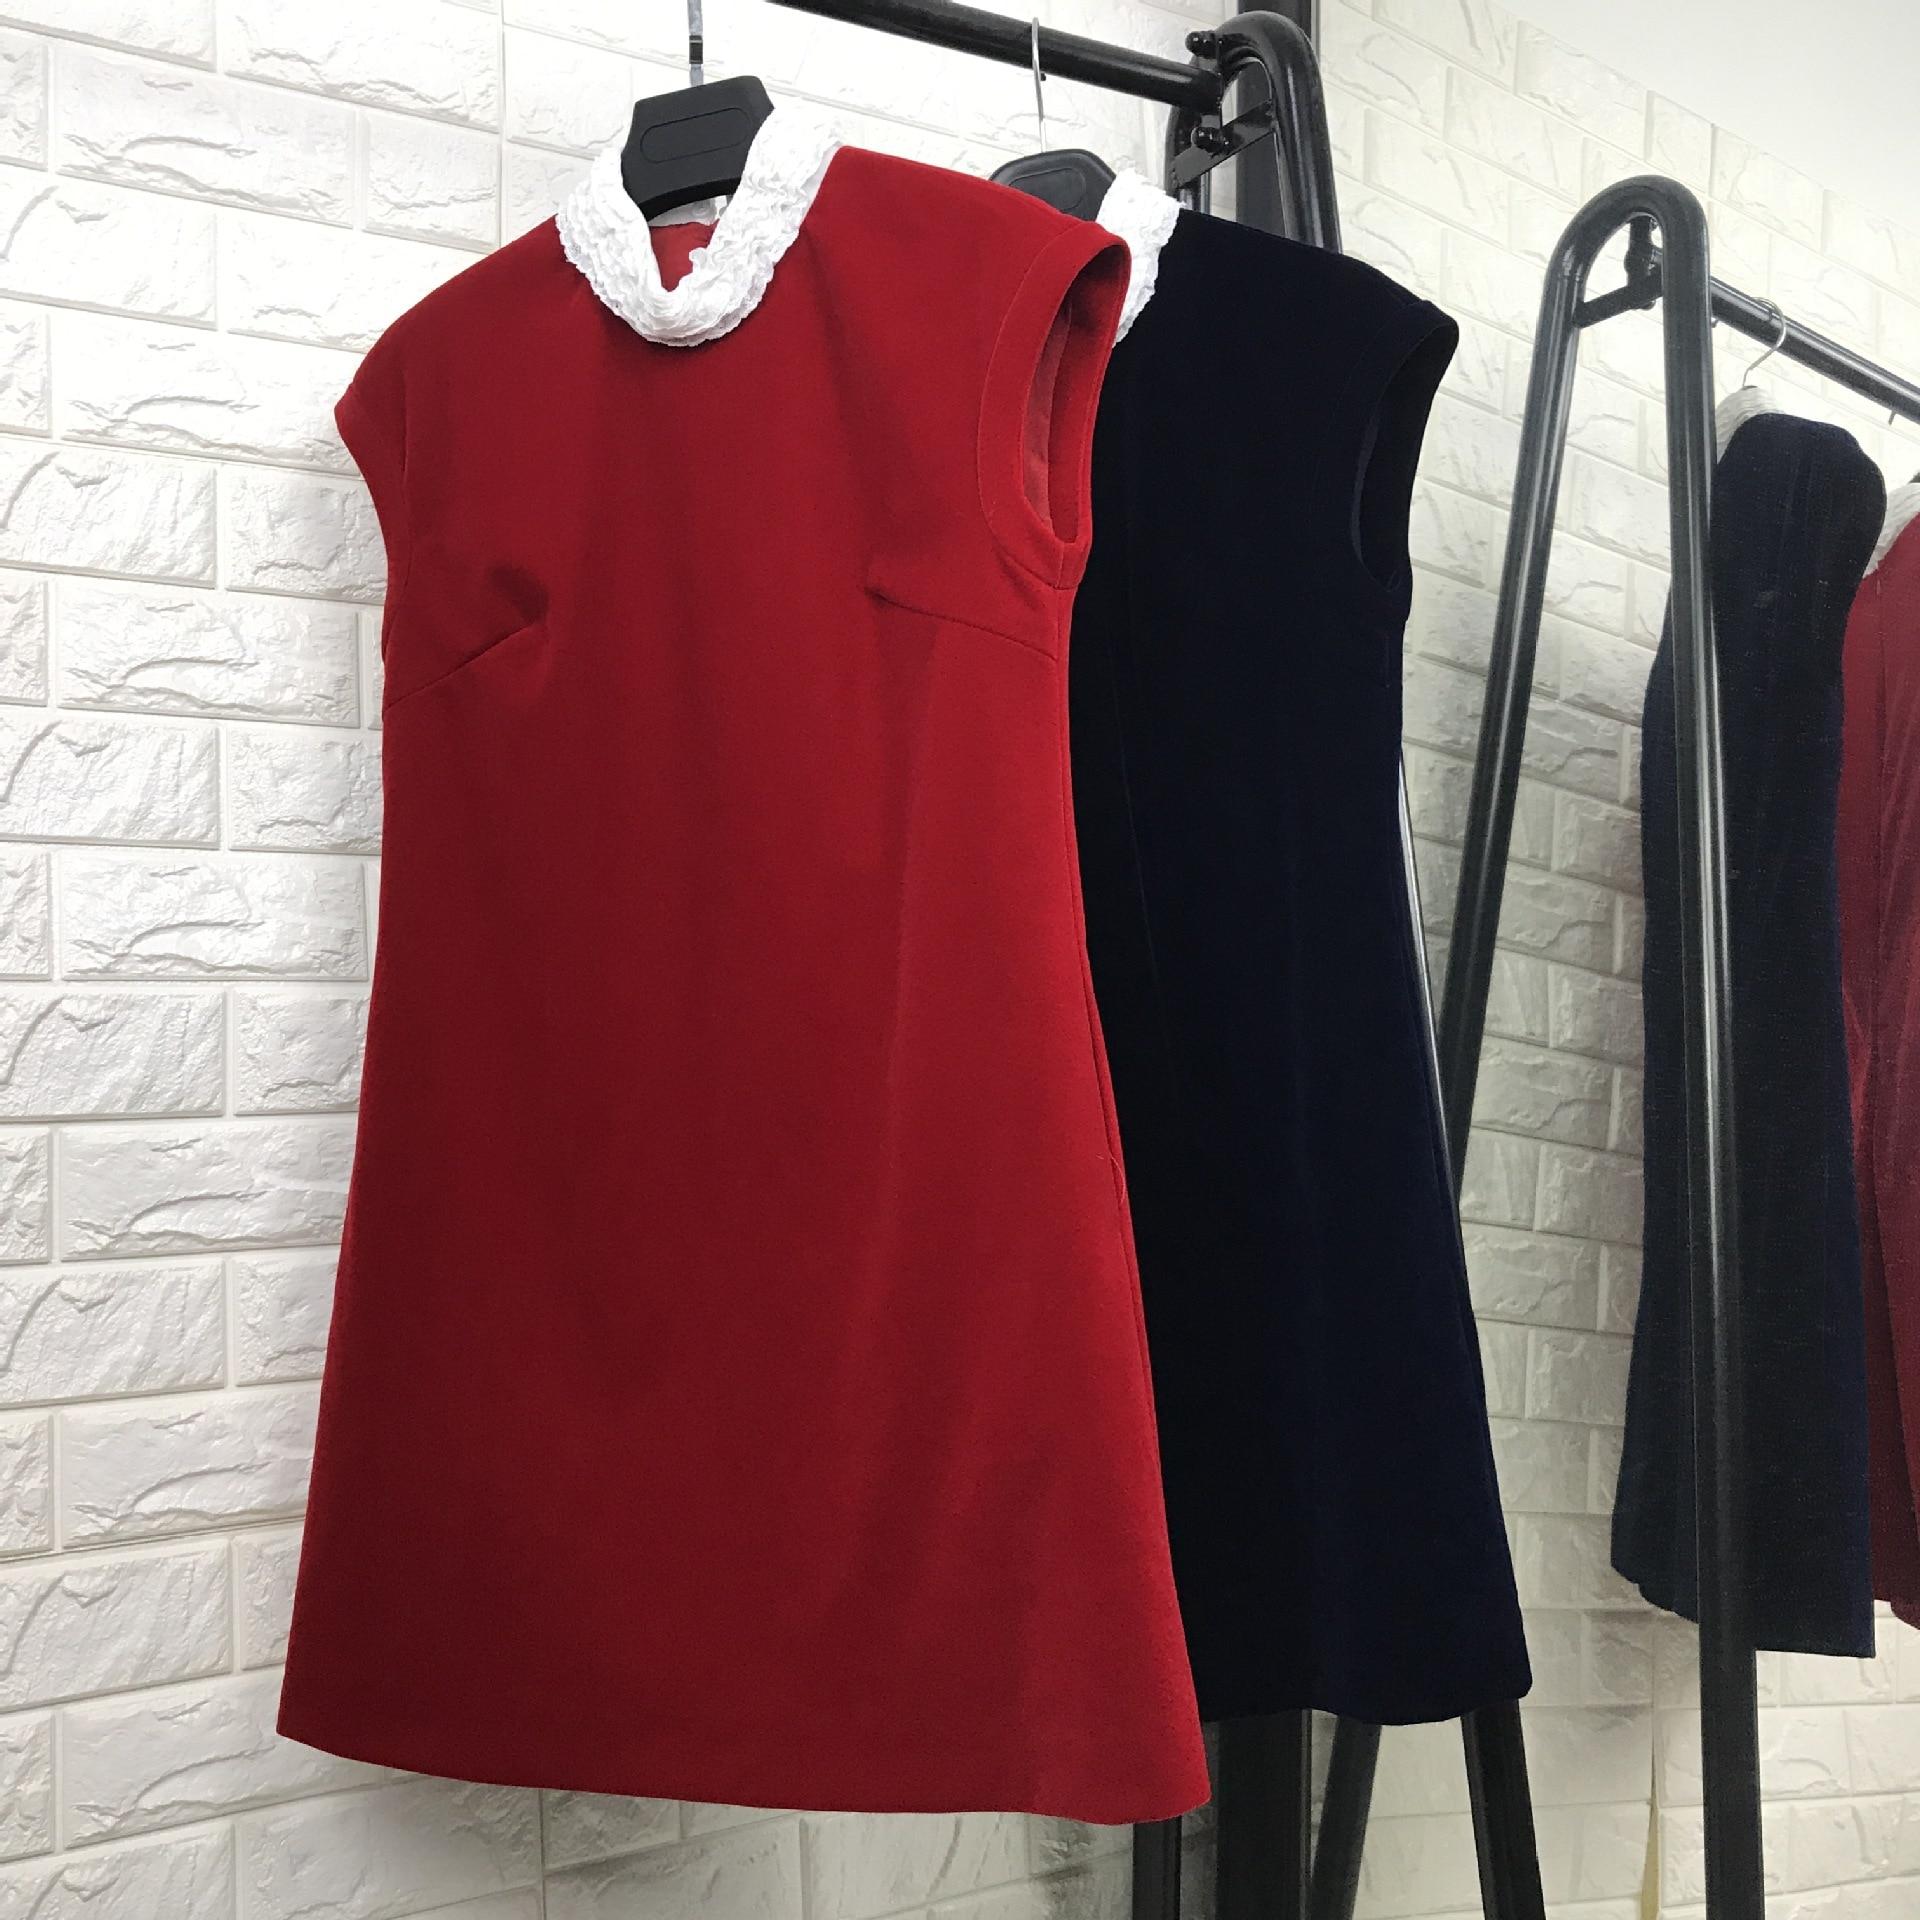 New arrival 2017 autumn fashion women velvet dress sleeveless loose style white collar casual a-line dresses black red